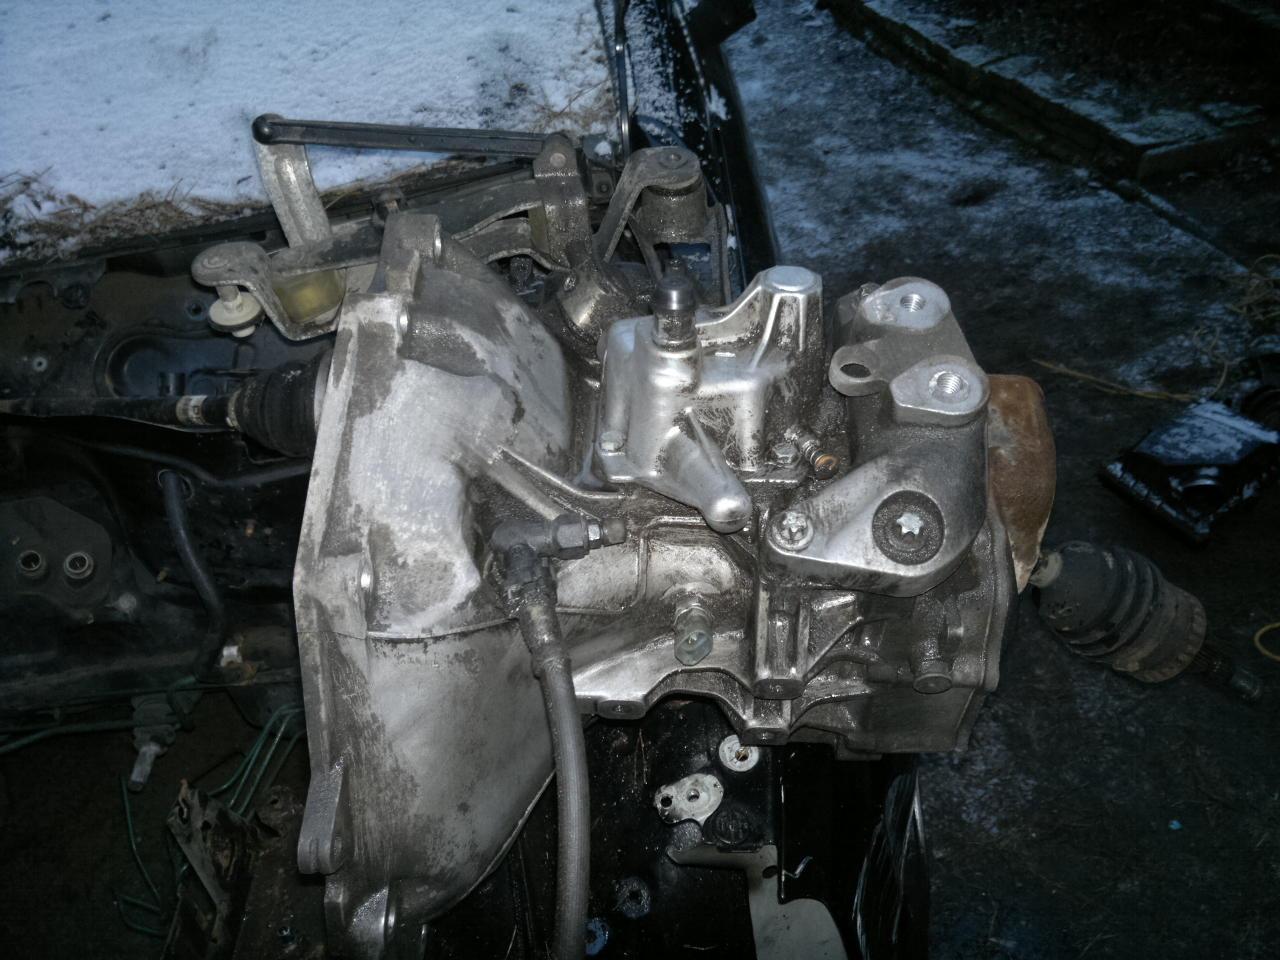 Skrzynia Biegw F13 W355 Opel Corsa Combo 17 Dti 7219362072 1 7 Wiring Diagram